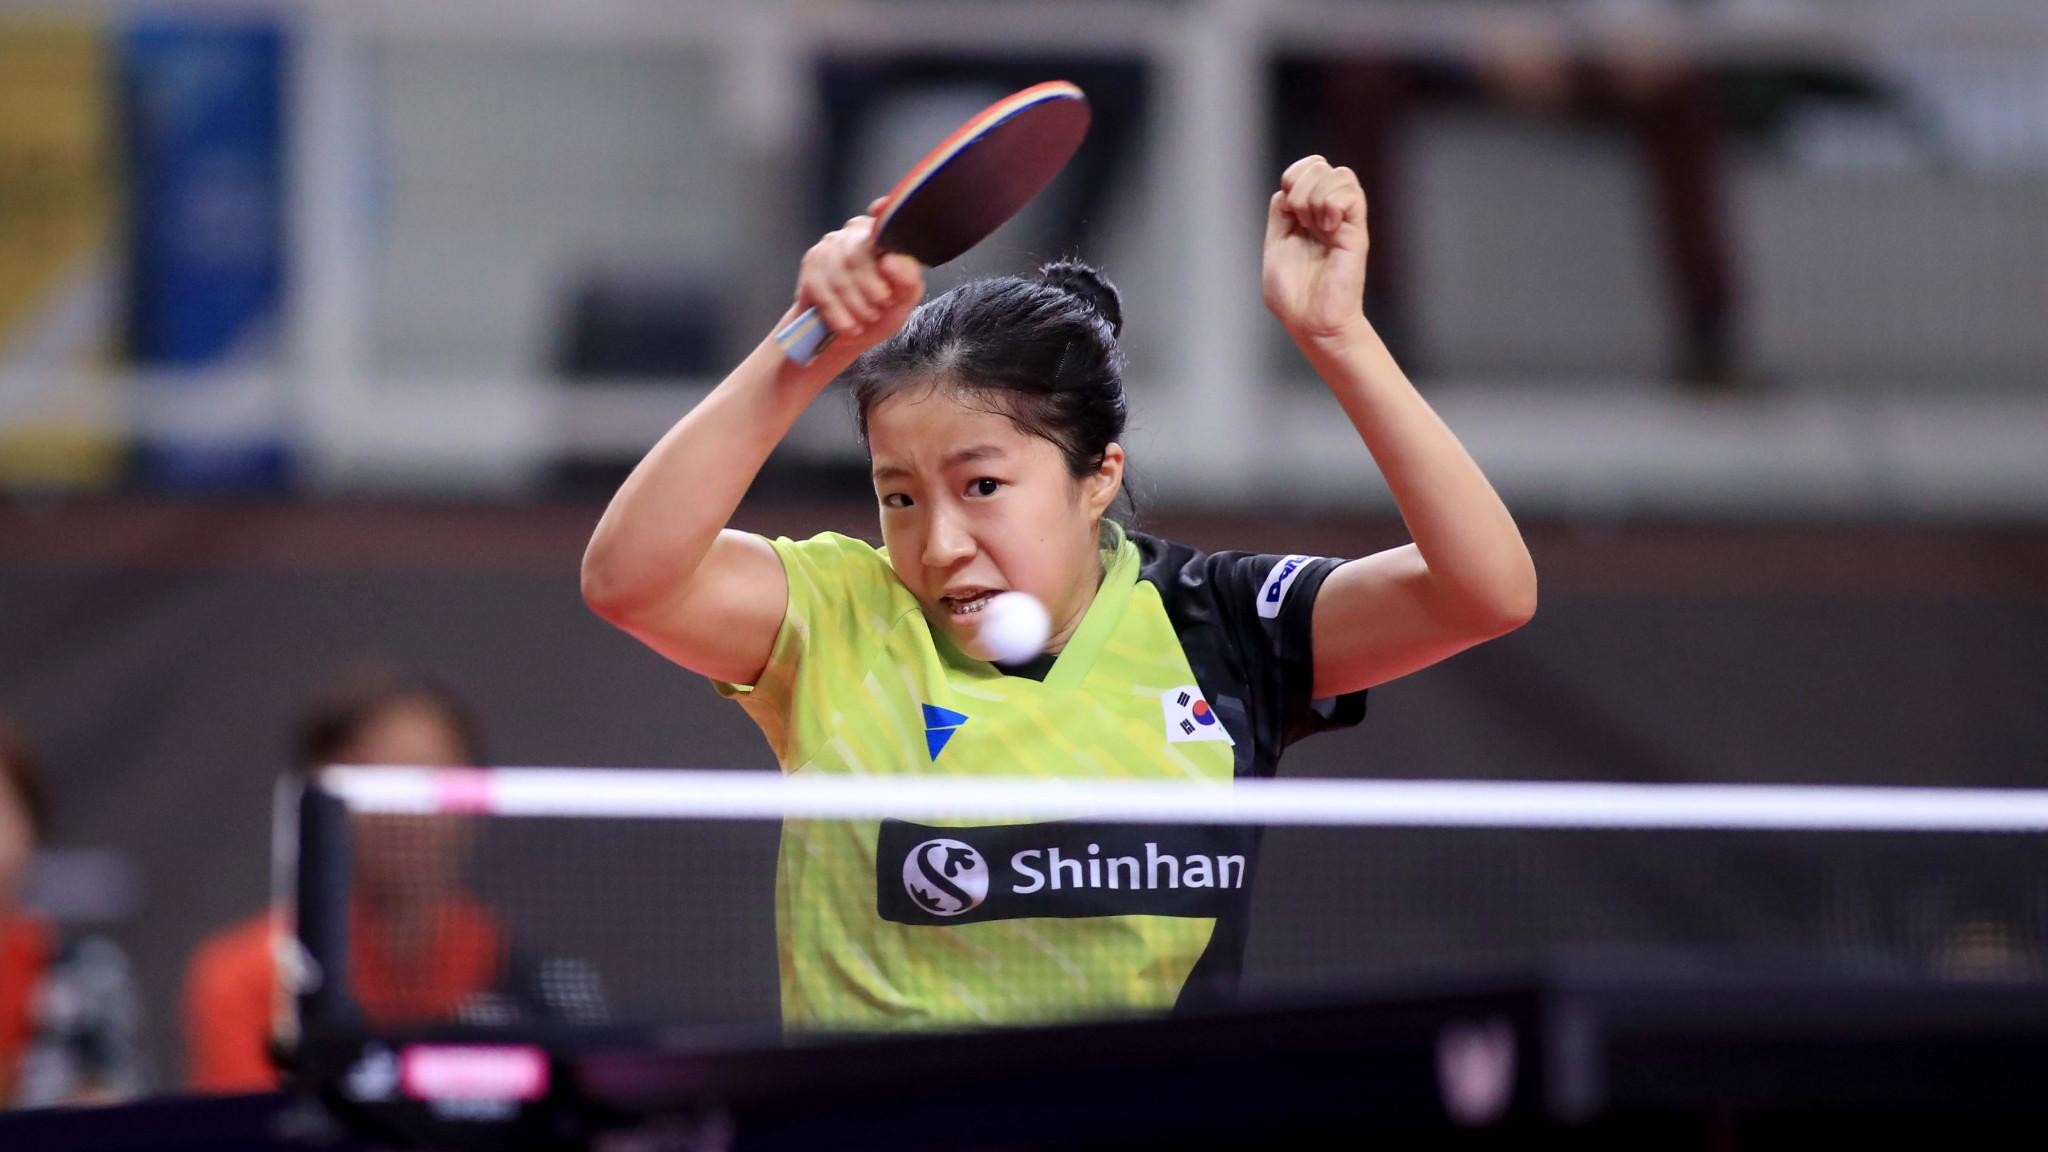 Shin Yu-bin of South Korea won the match that gave her team a place at Tokyo 2020 ©ITTF